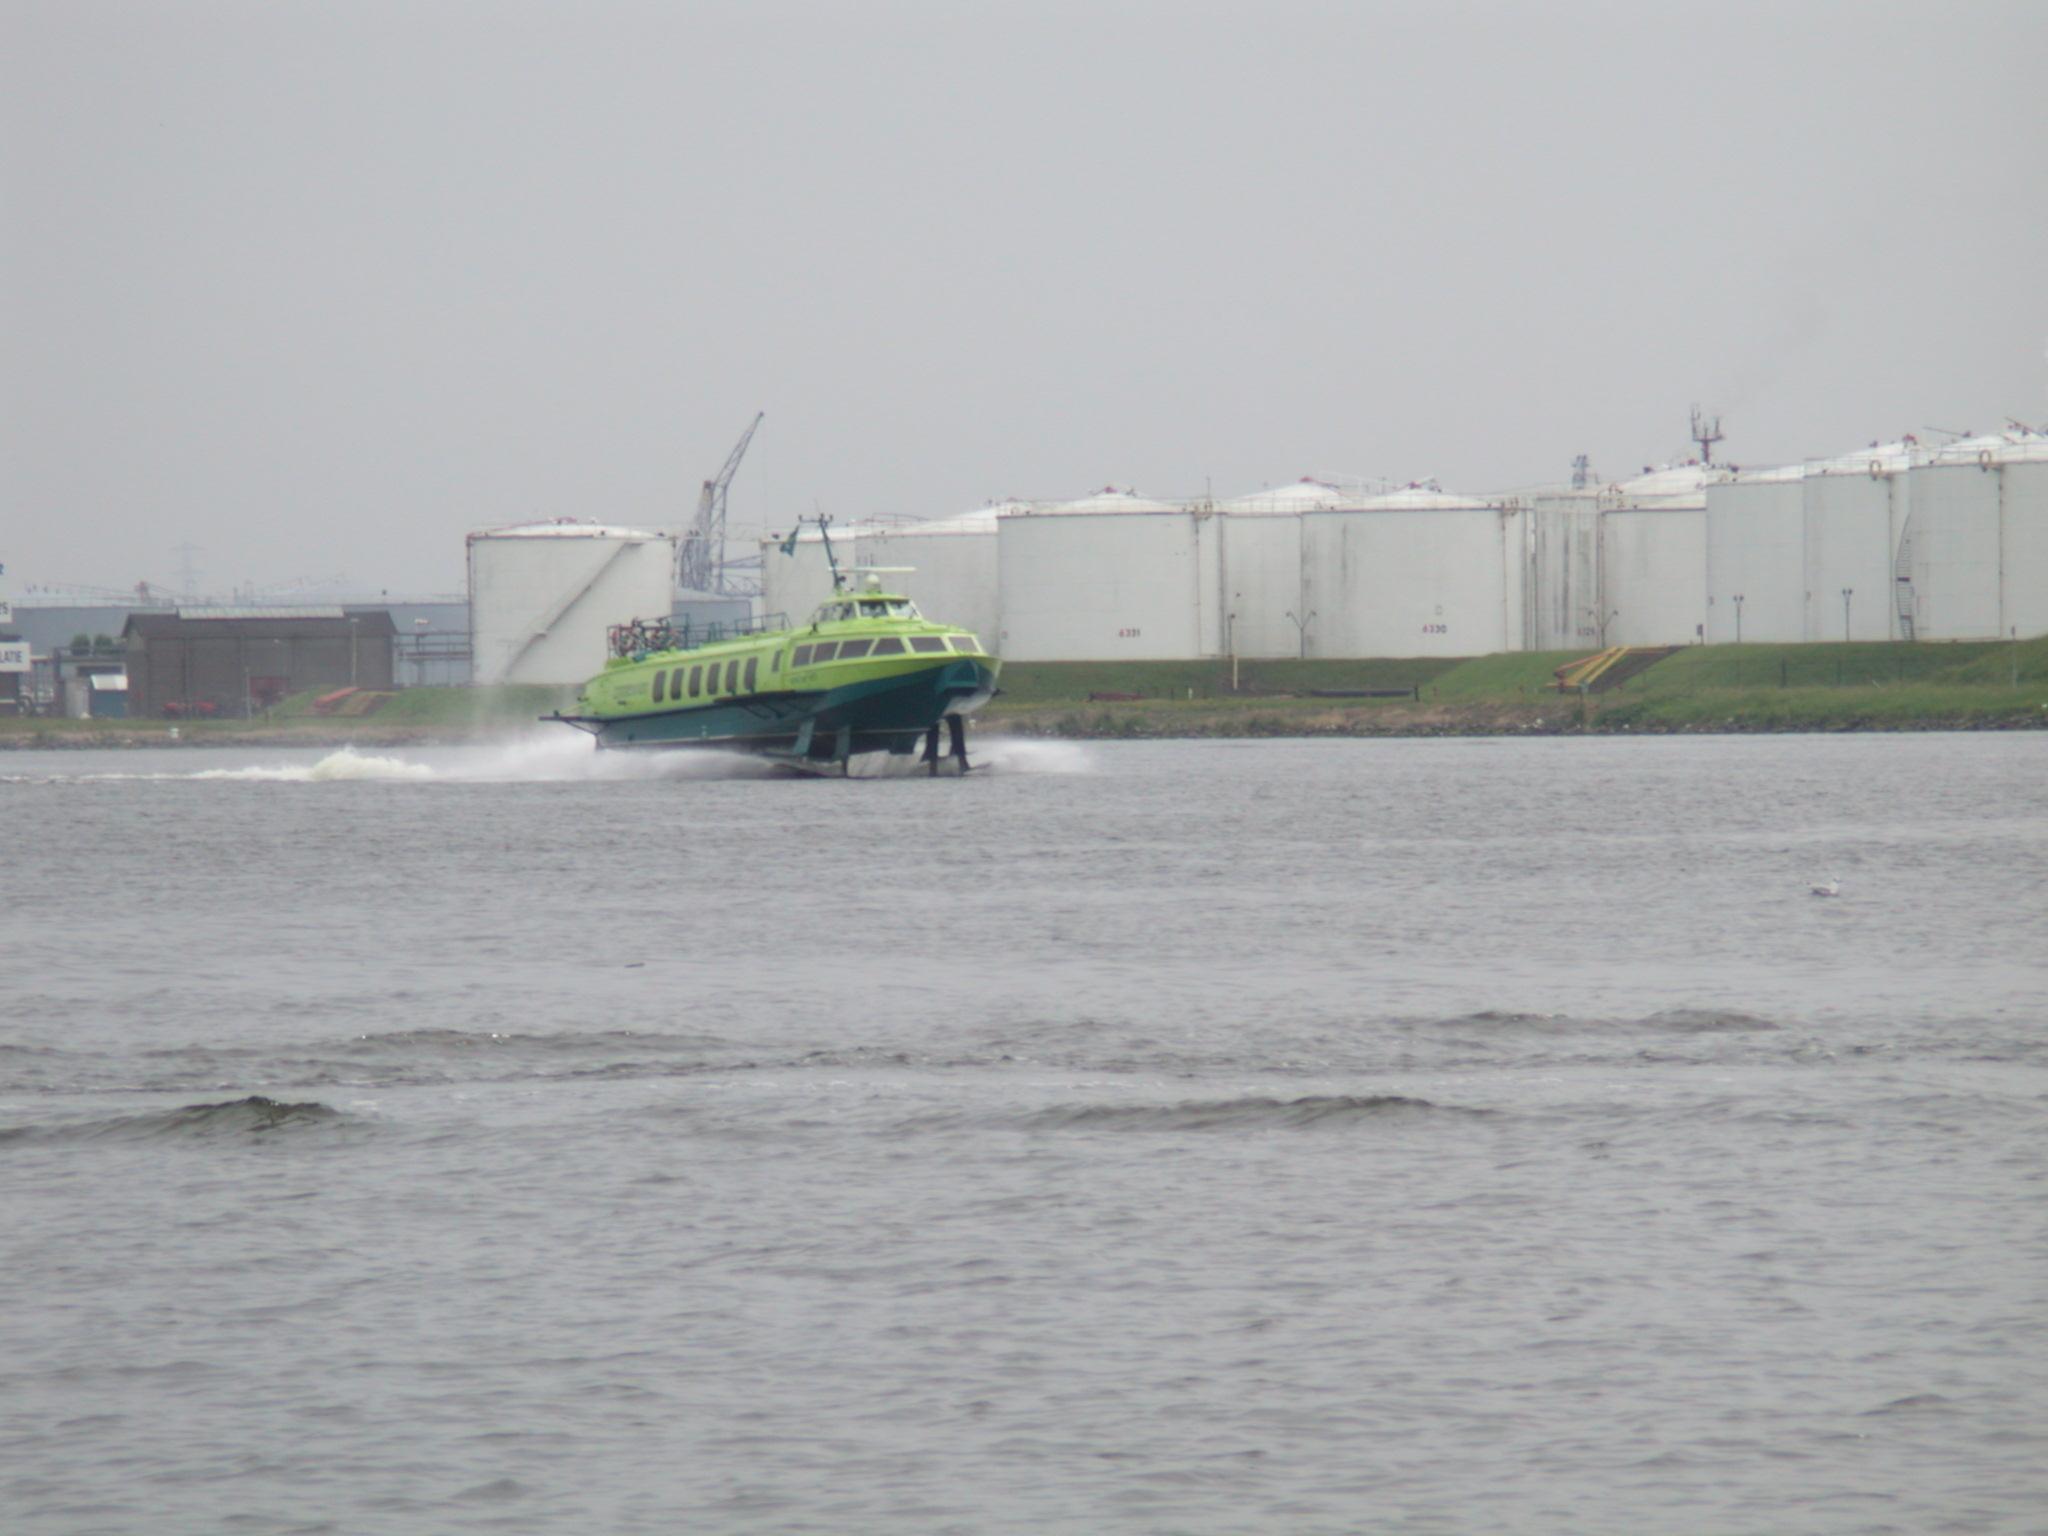 vehicles water transport publictransport public water waterscape highspeed boat russian connexxion